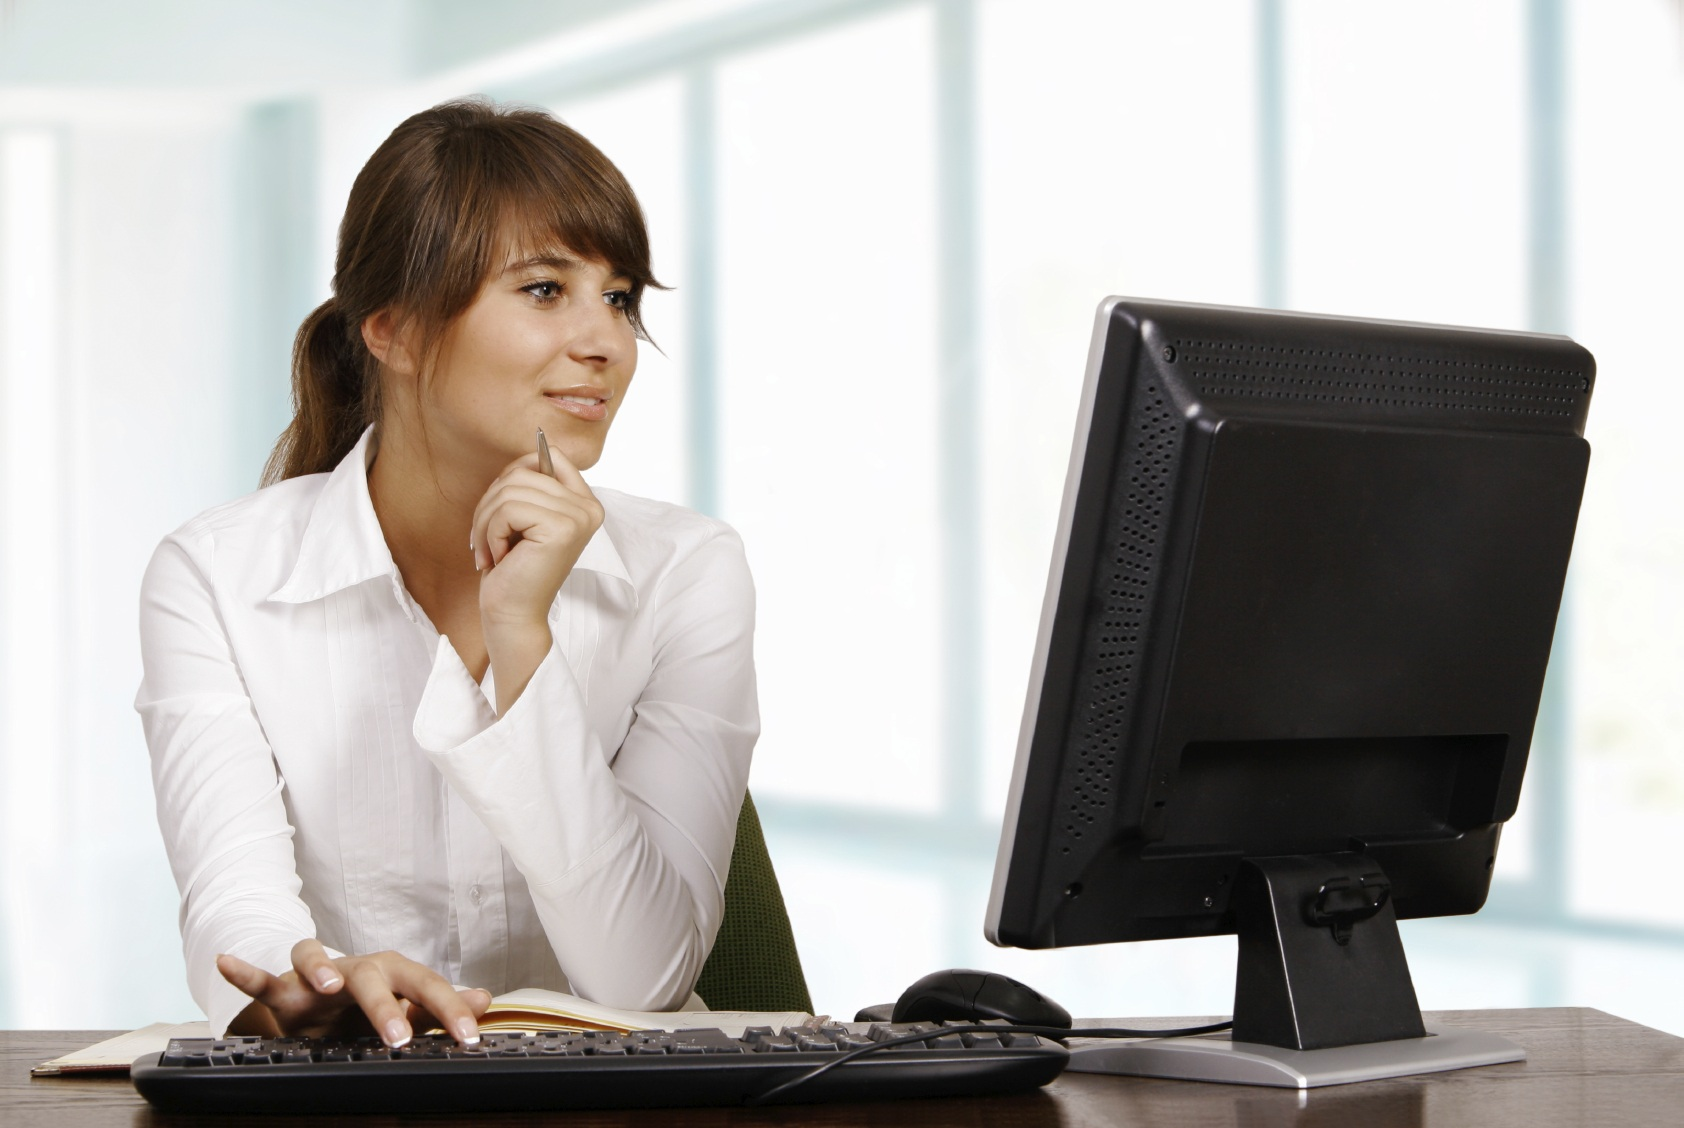 Девочка перед компьютером картинка